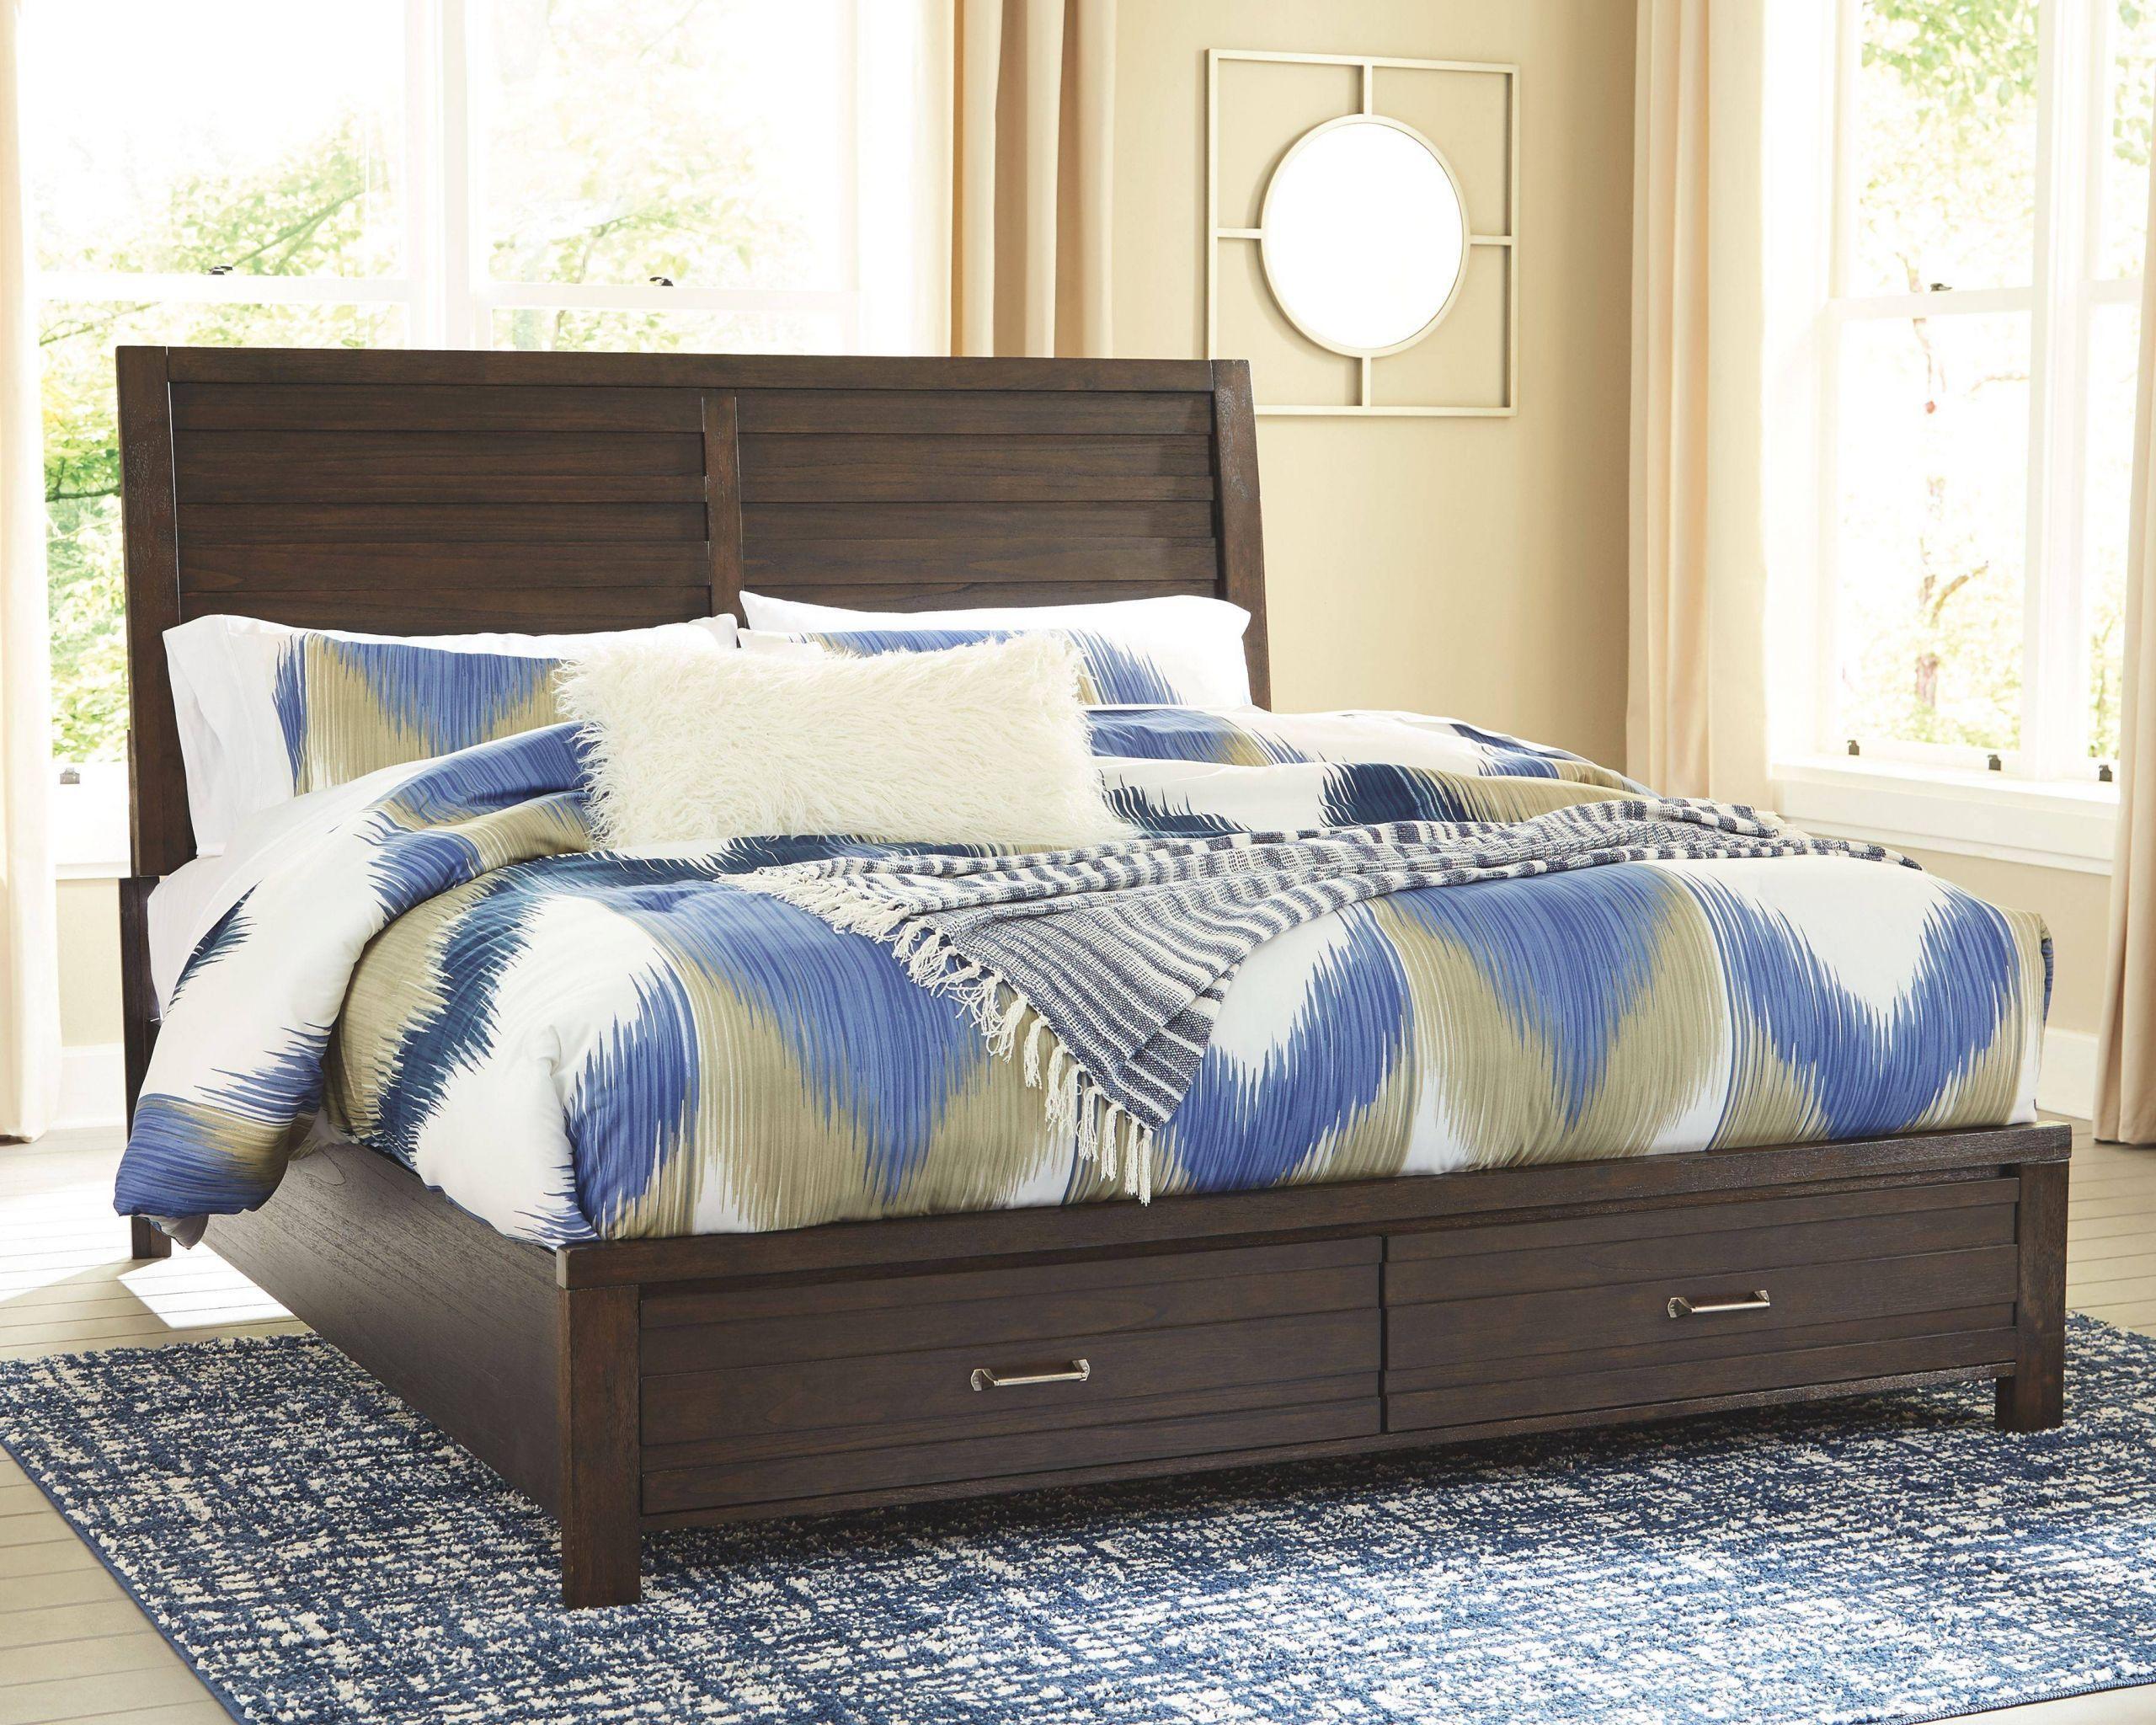 King Bed Architecture Design Interiordesign Art Photography